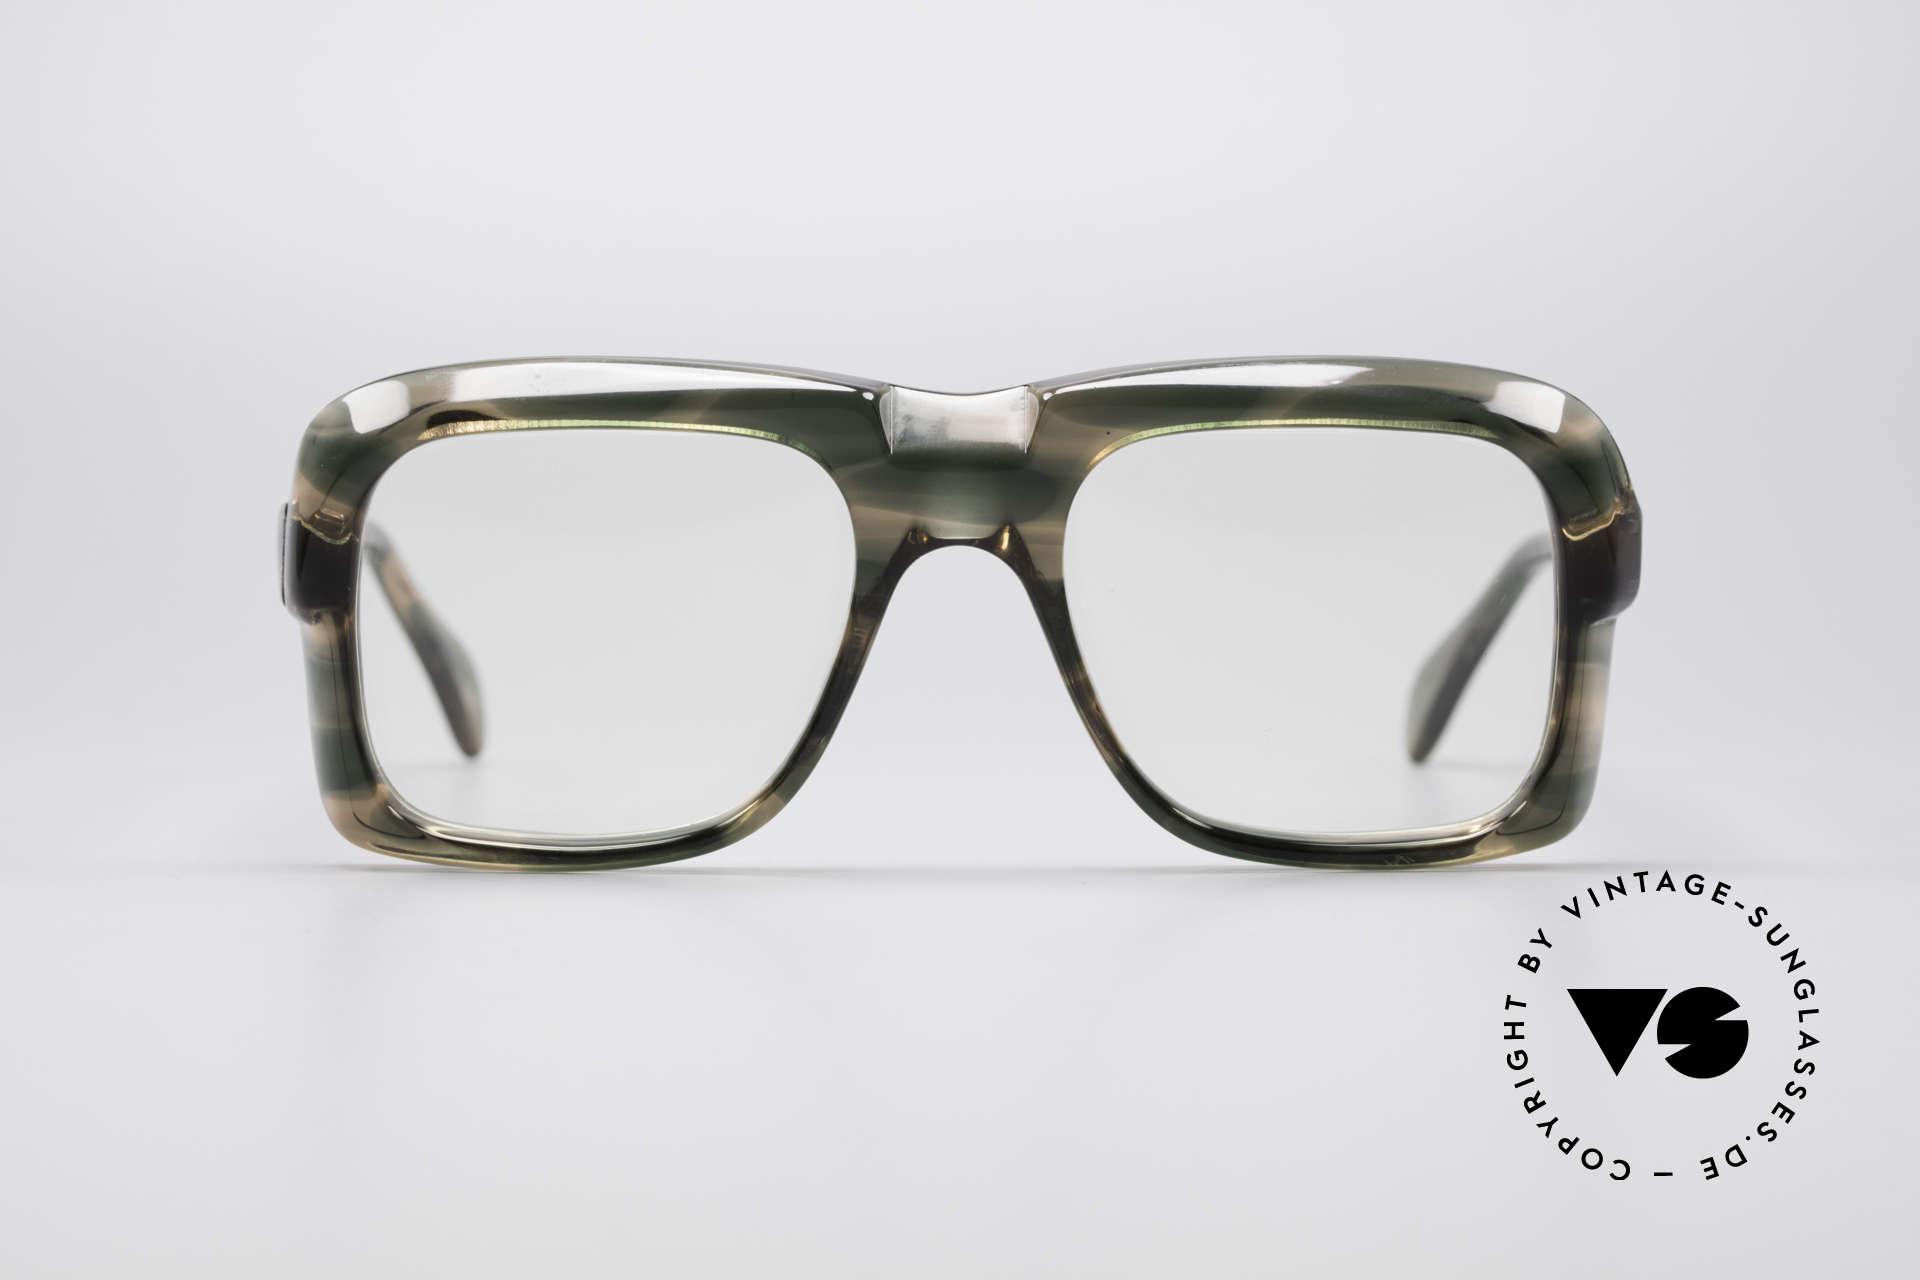 b34247bc41d3 Old School Glasses For Men